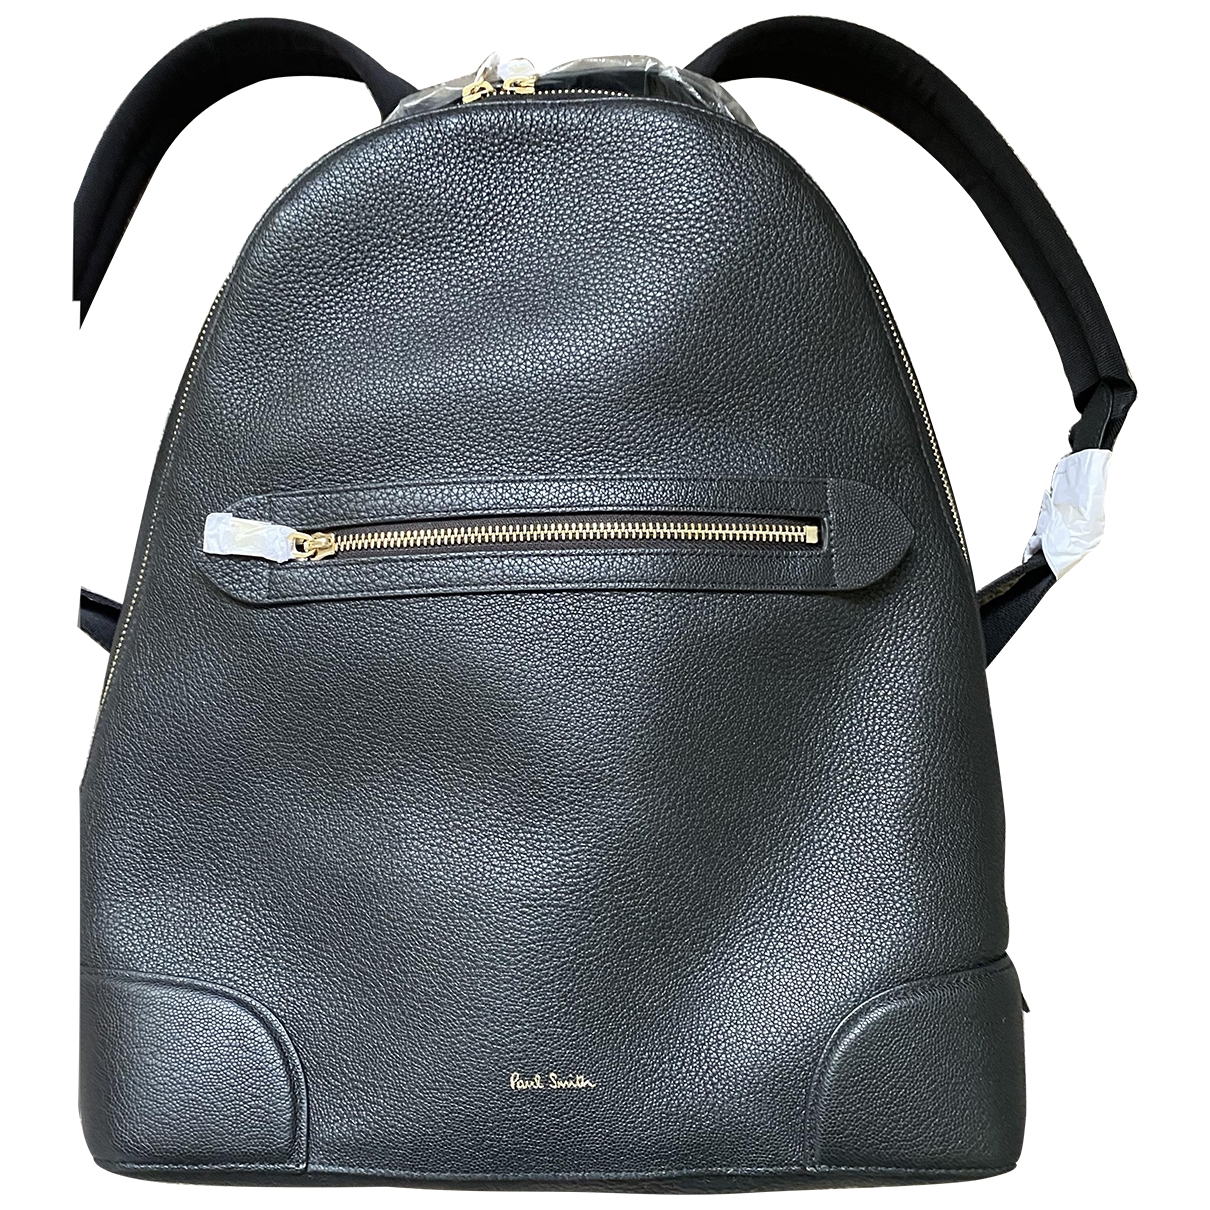 Paul Smith \N Black Leather bag for Men \N